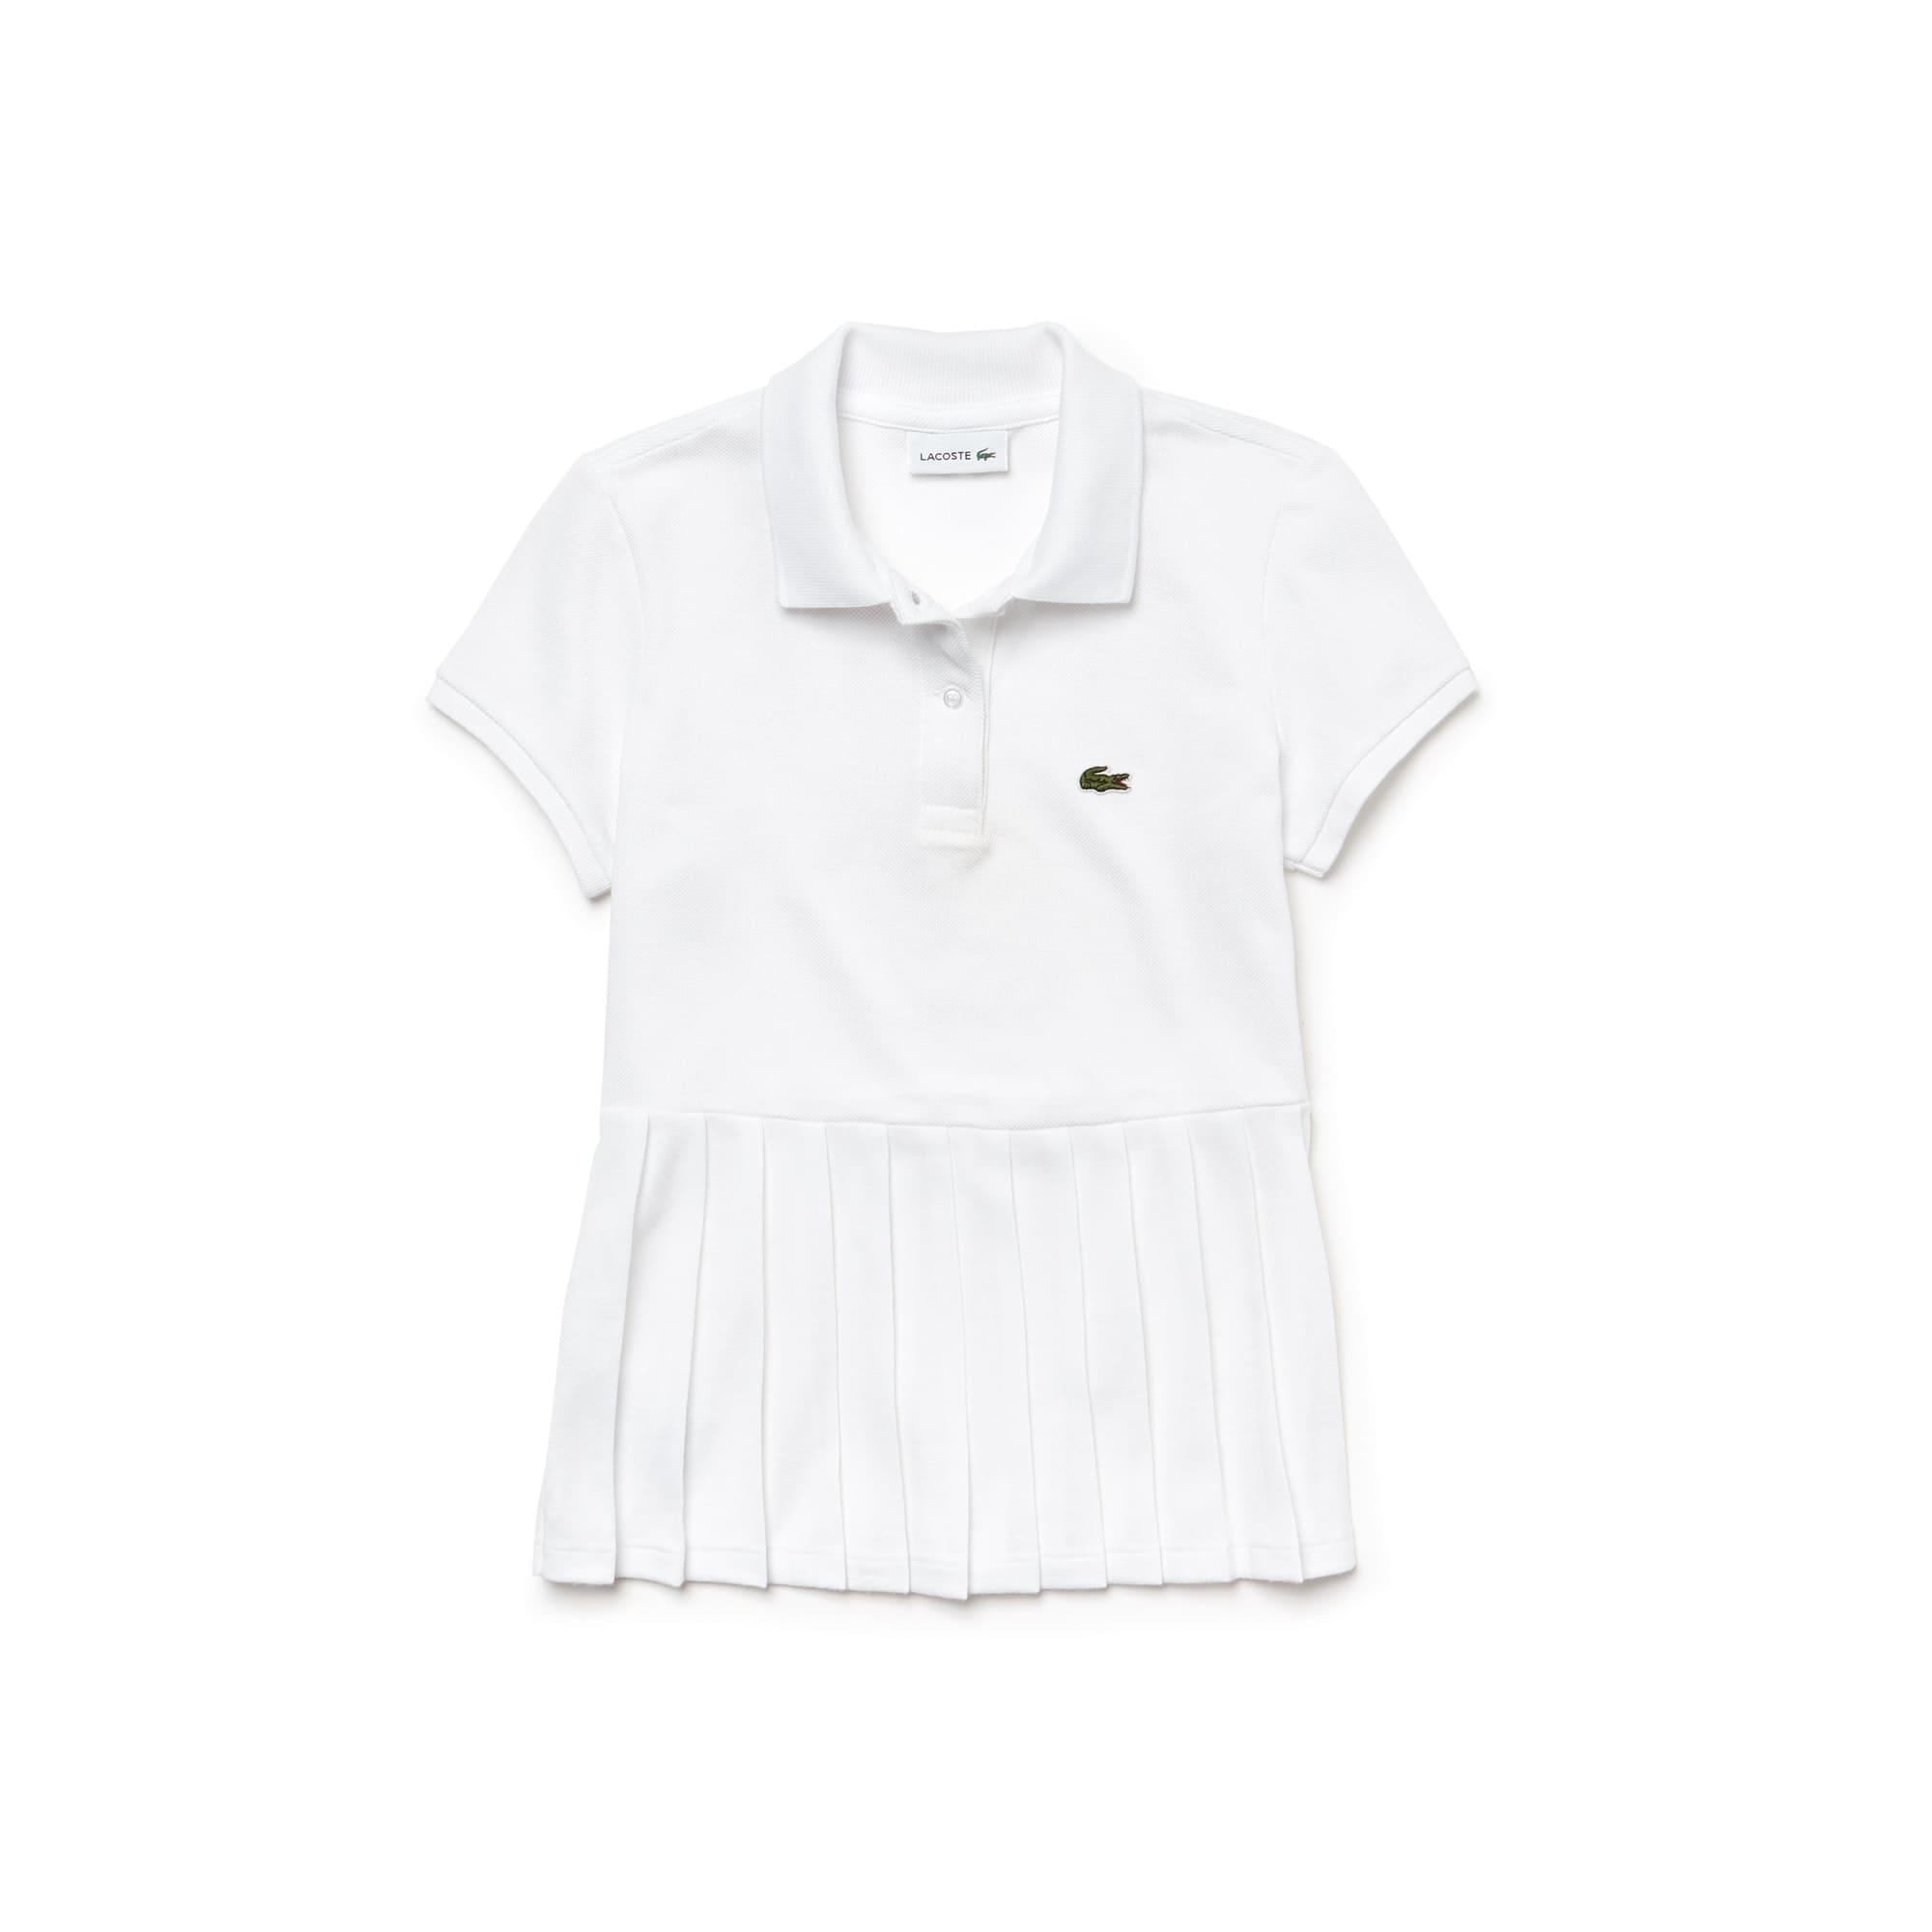 231fa5659fd1 Girls  Lacoste Flat Pleated Cotton Petit Piqué Polo Shirt